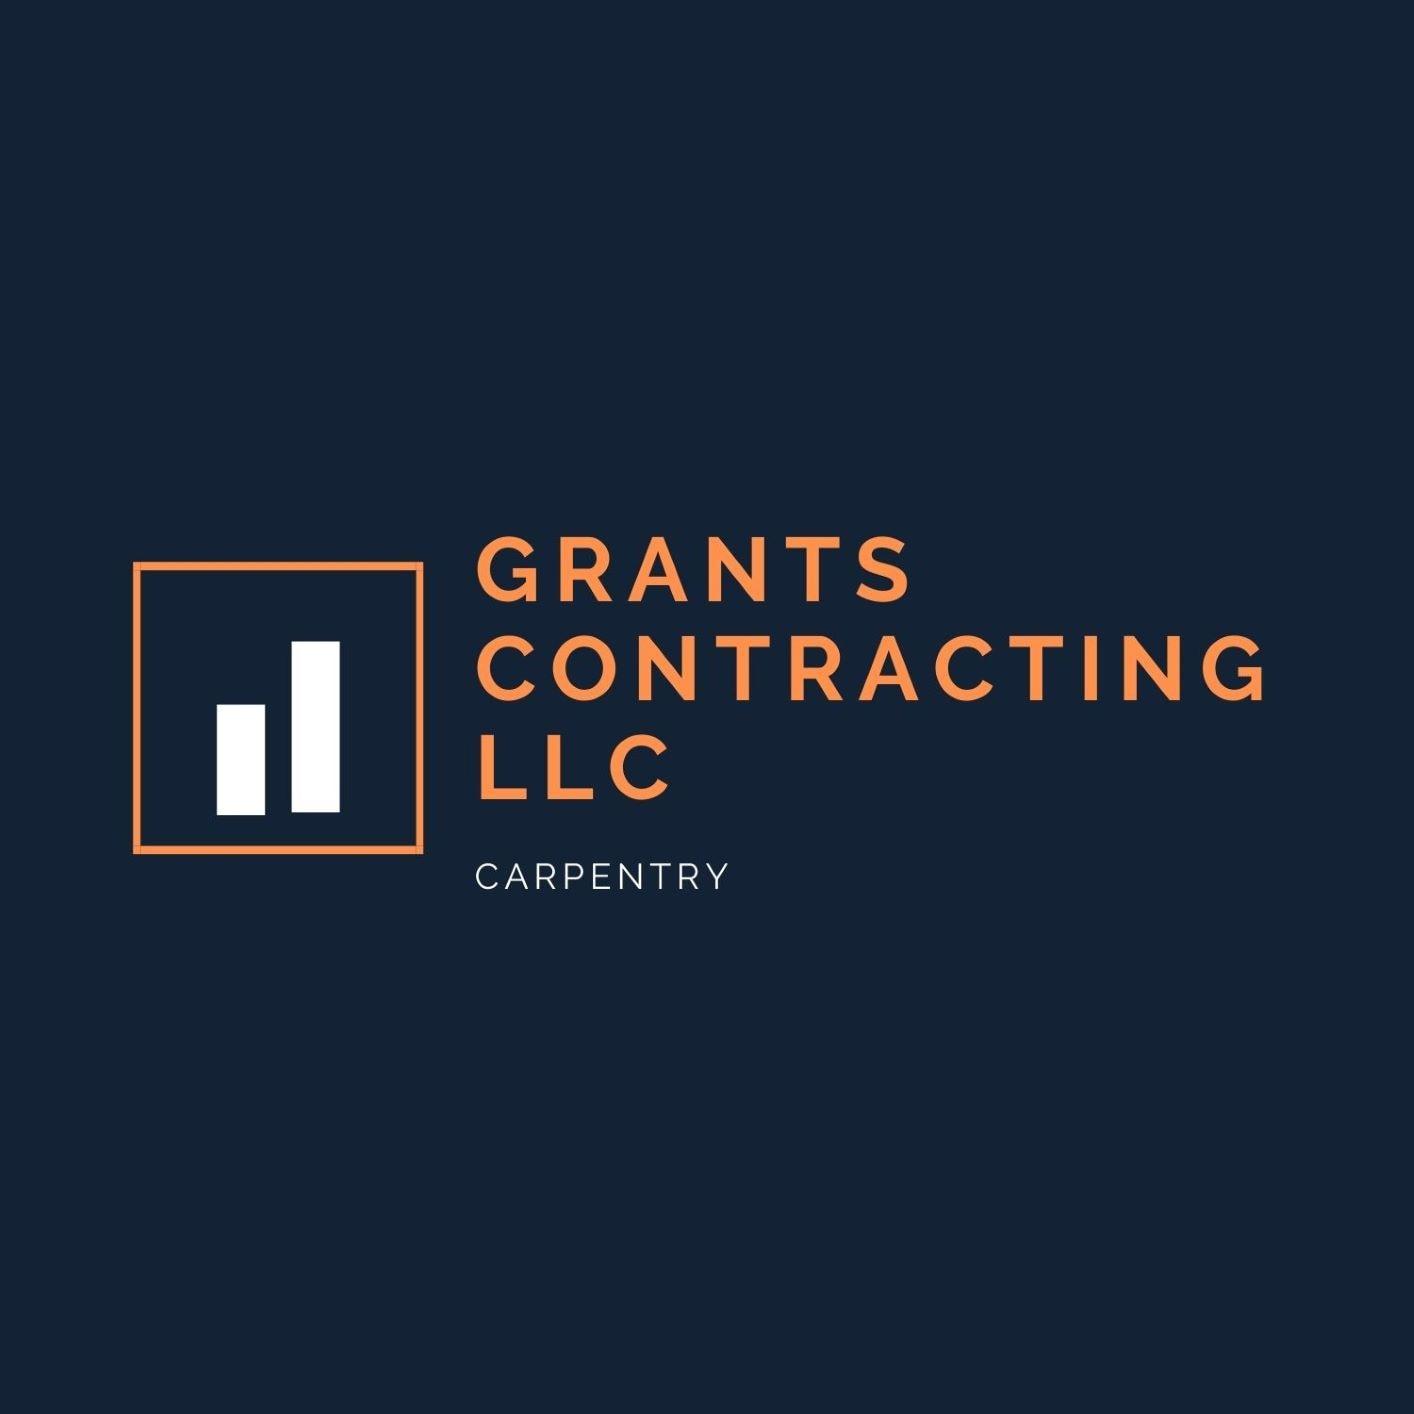 Grant's Contracting LLC